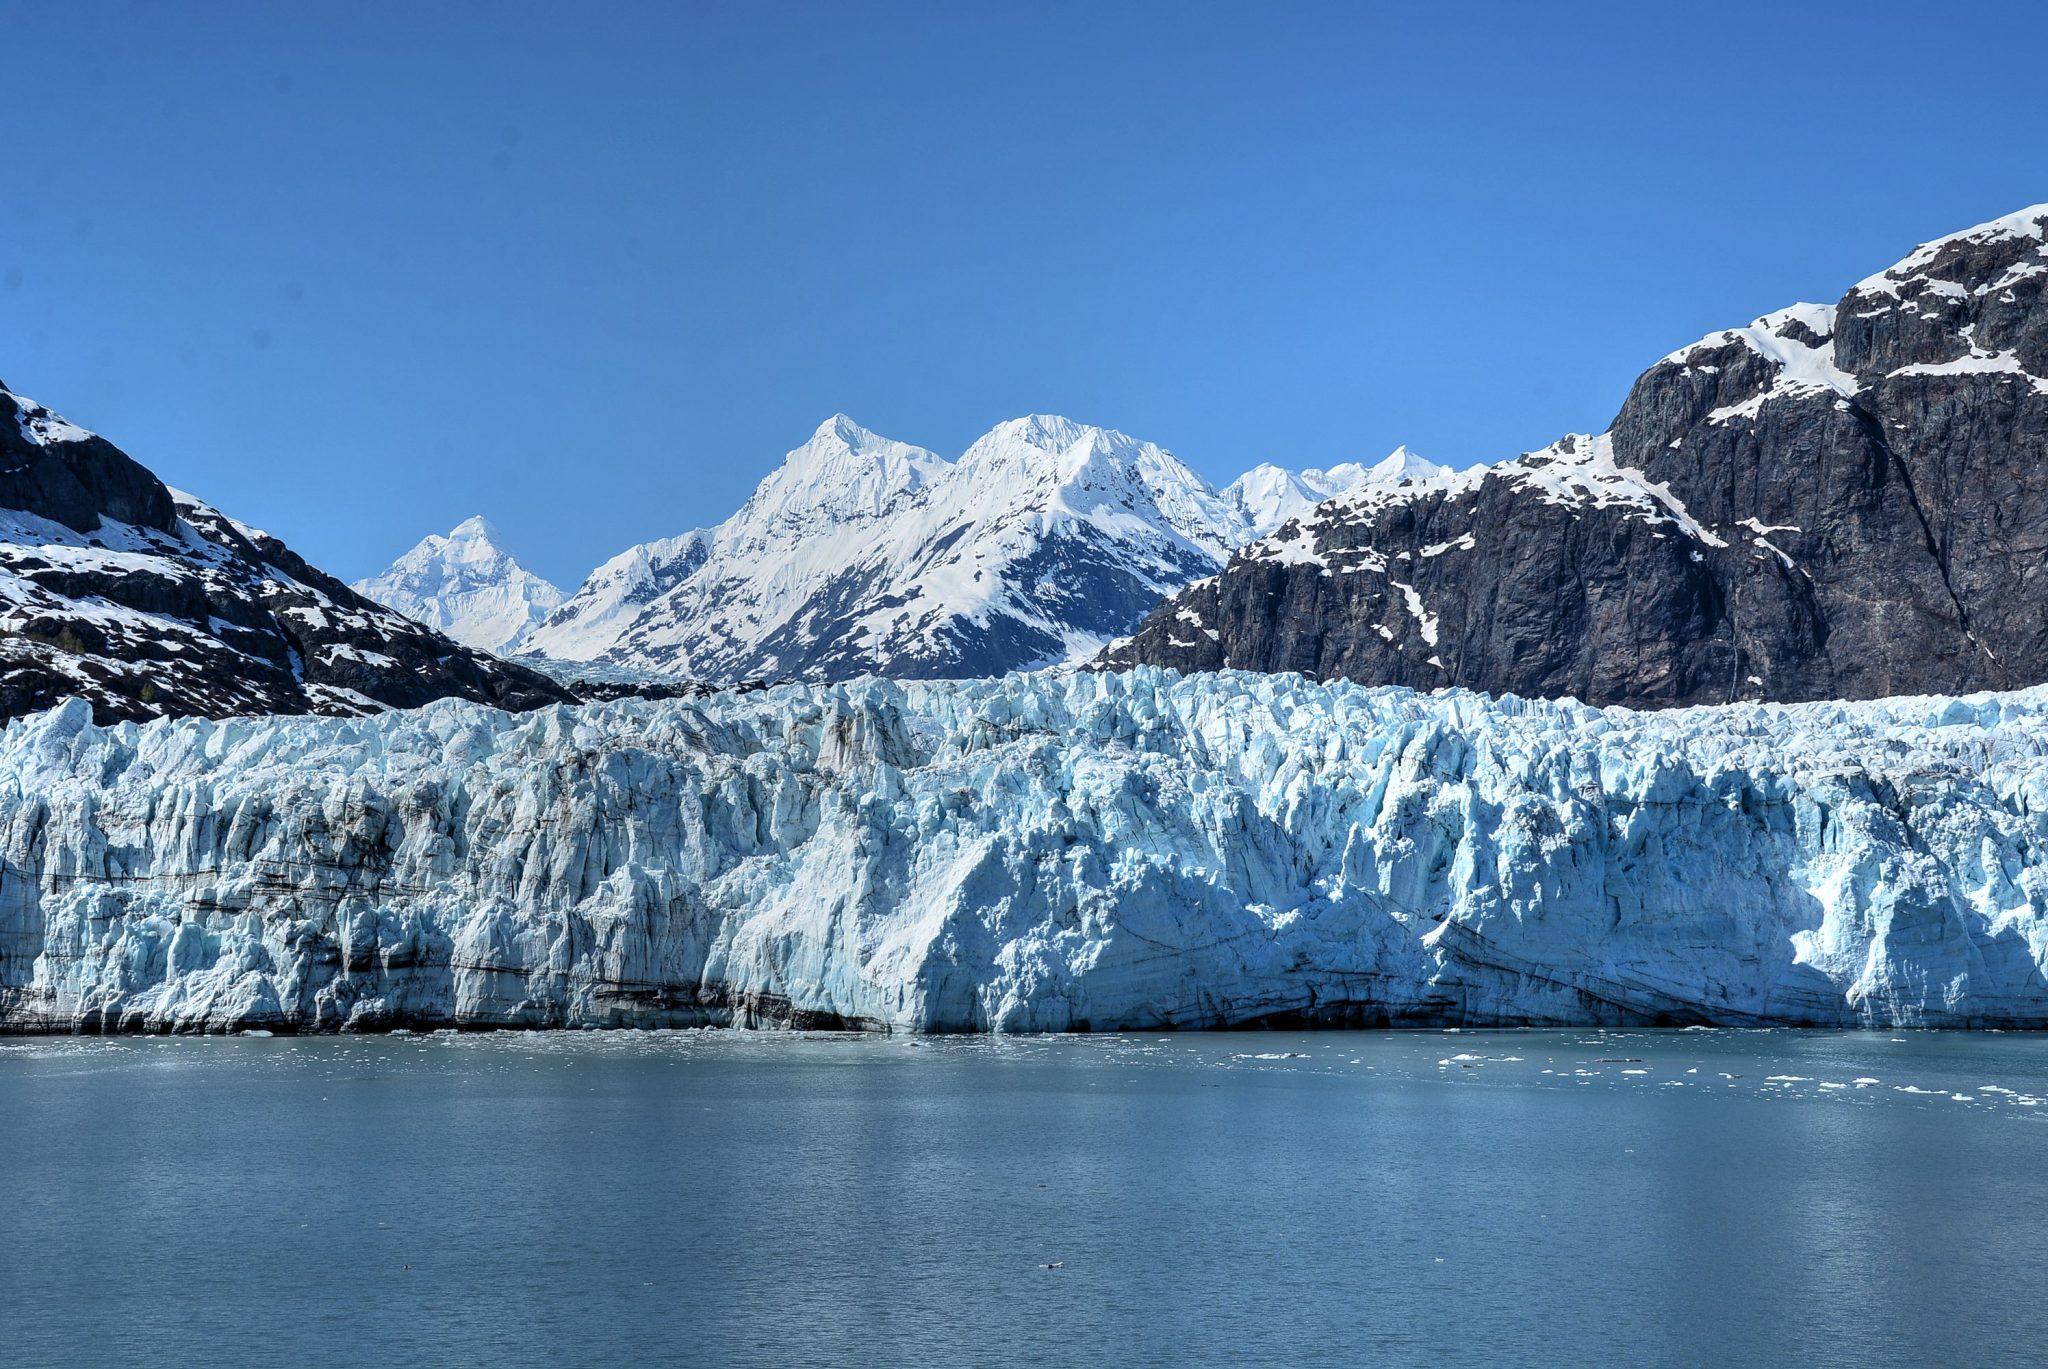 Our Alaskan cruise-Glacier Bay